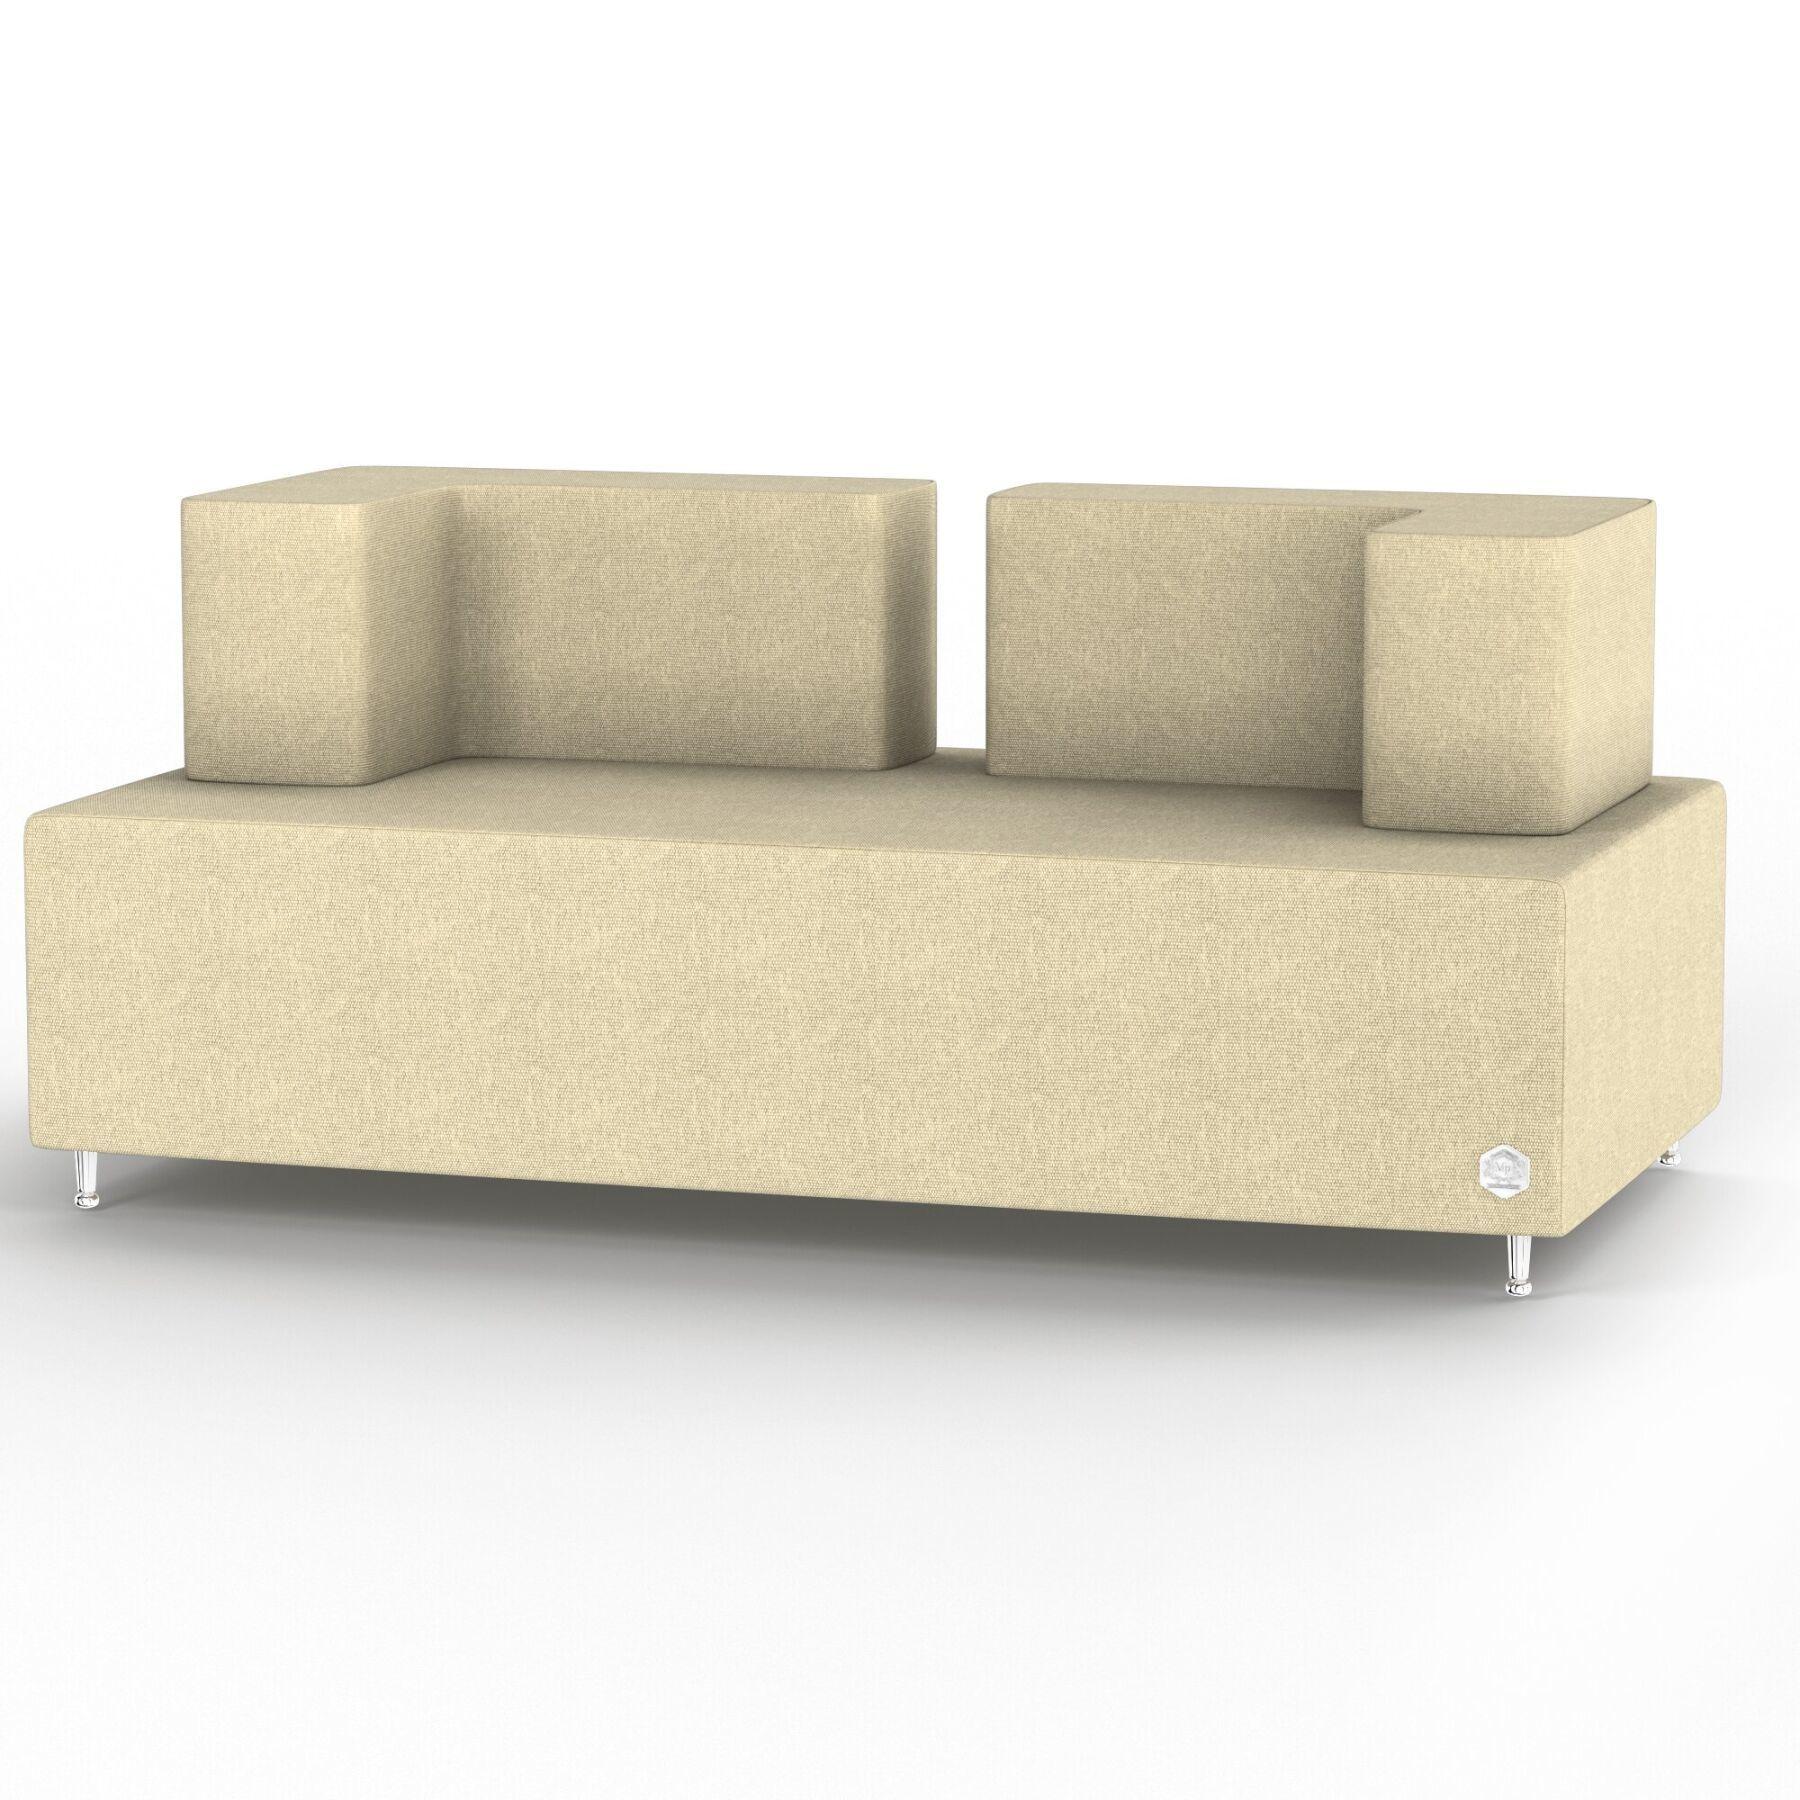 Двухместный диван KULIK SYSTEM BASE Ткань Целый